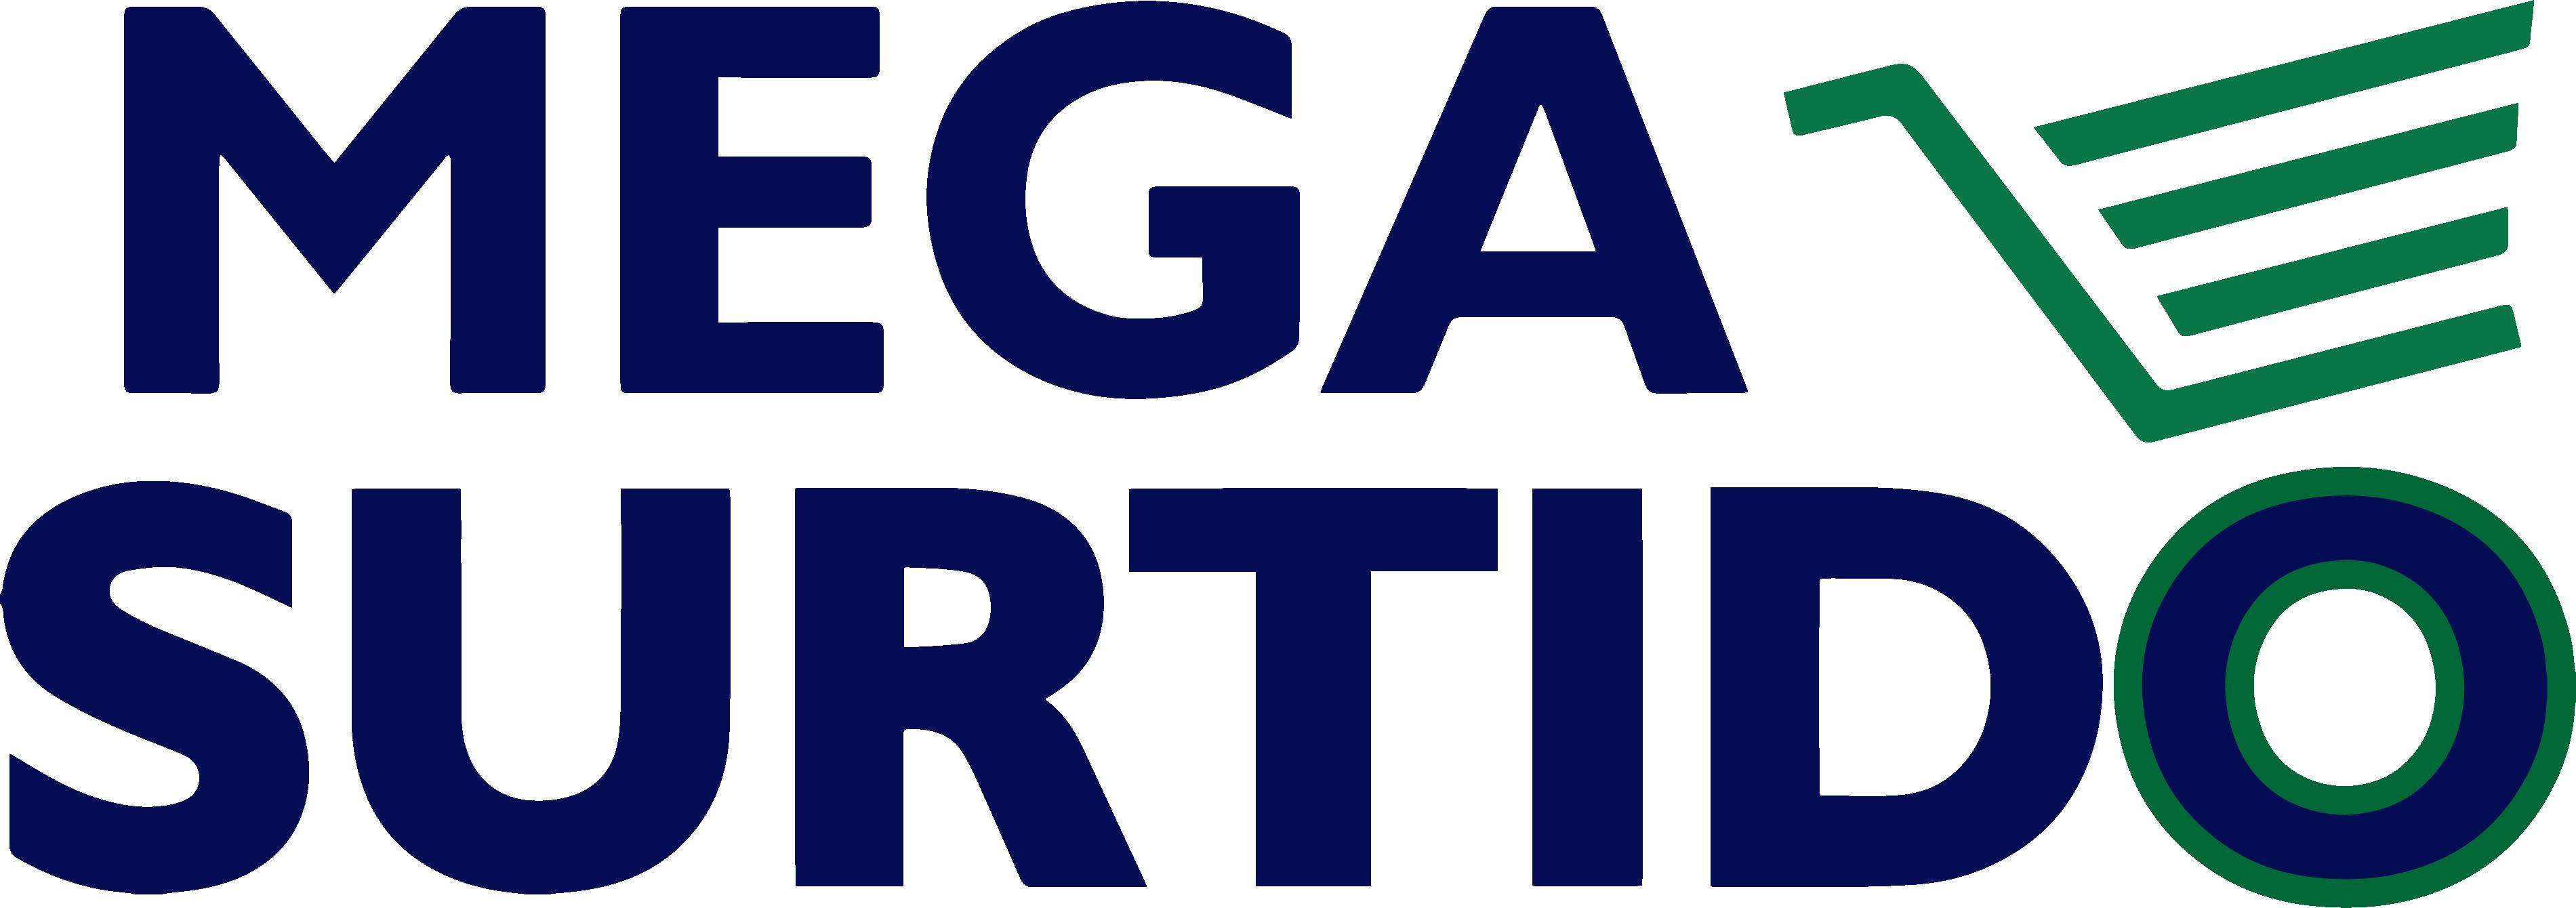 Megasurtido - Tienda Latina -Logo